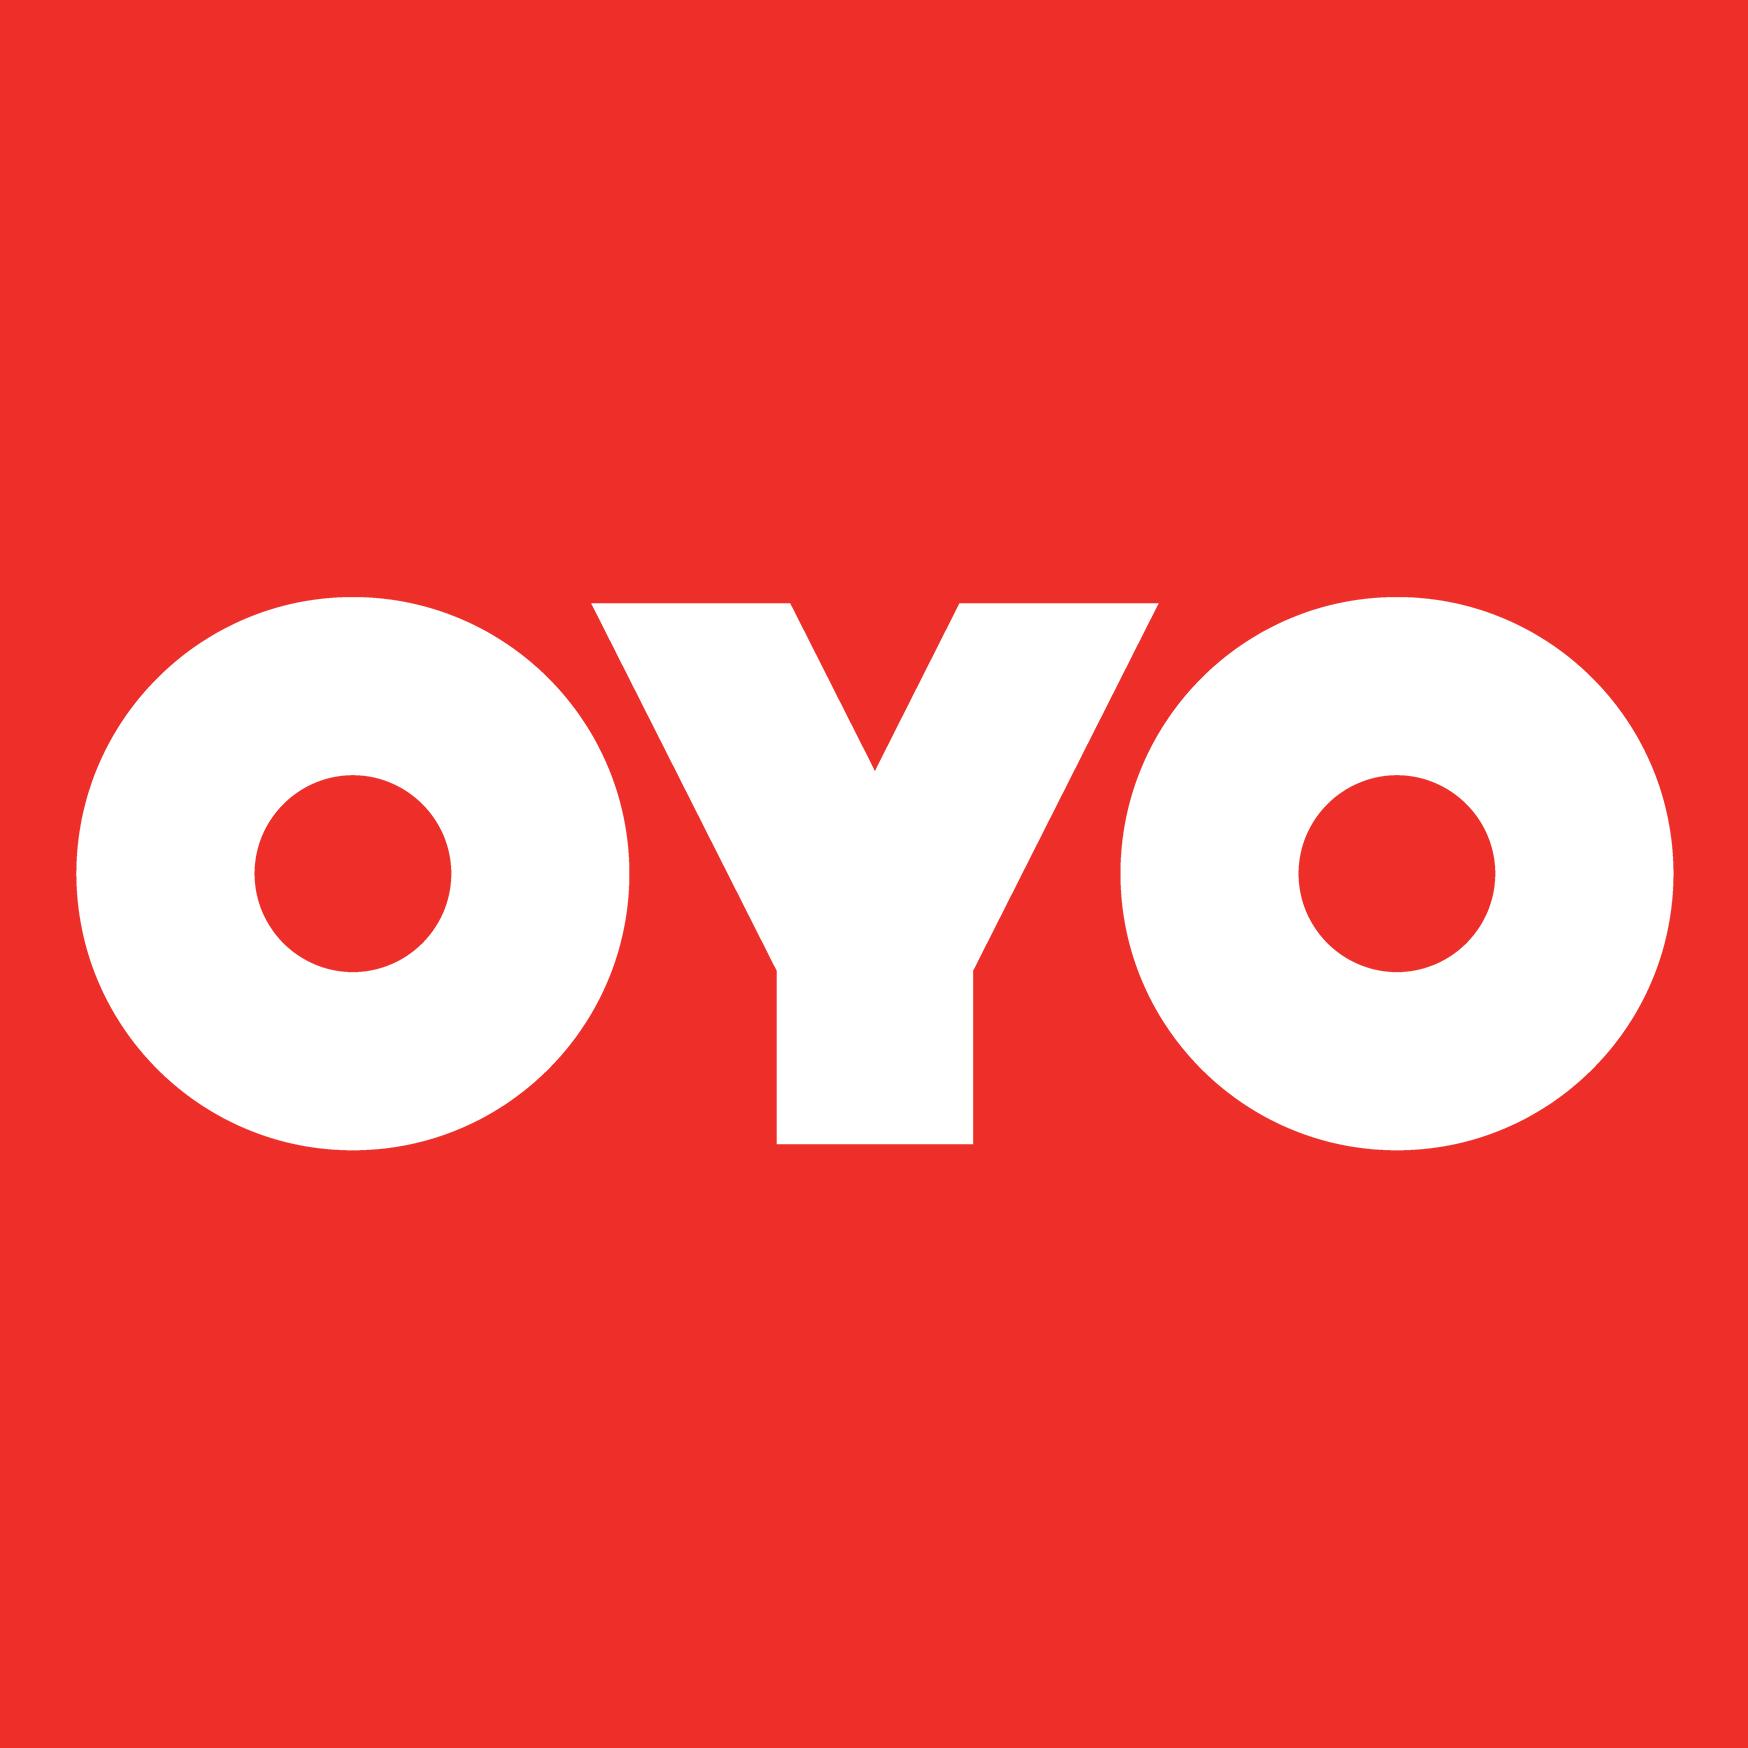 oyorooms.com/gb